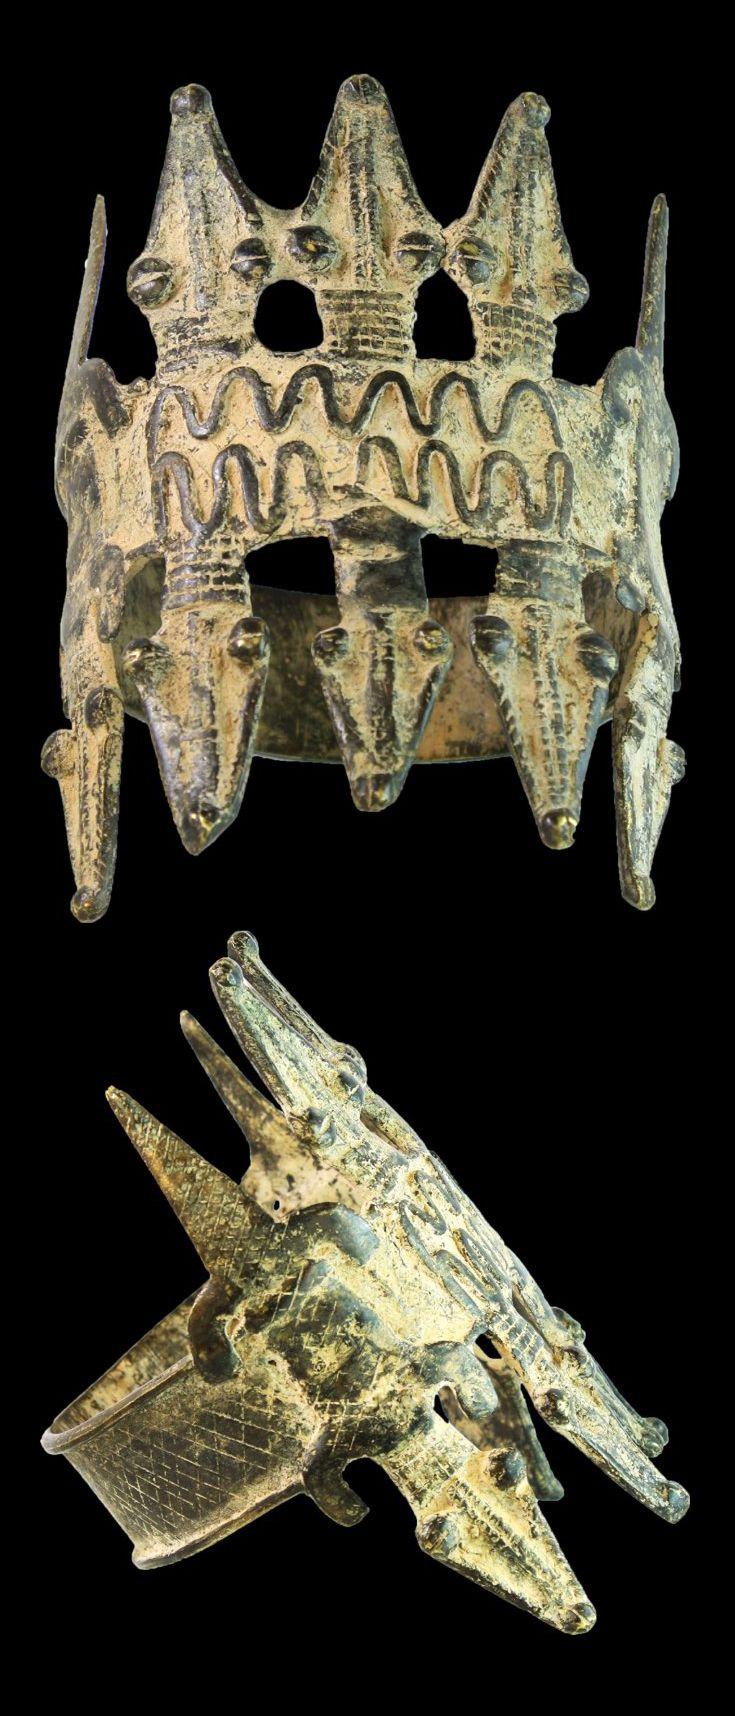 Burkina Faso | Bracelet from the Lobi people; with crocodiles. Bronze. 324 gr | ca. 1850 - 1900 AD